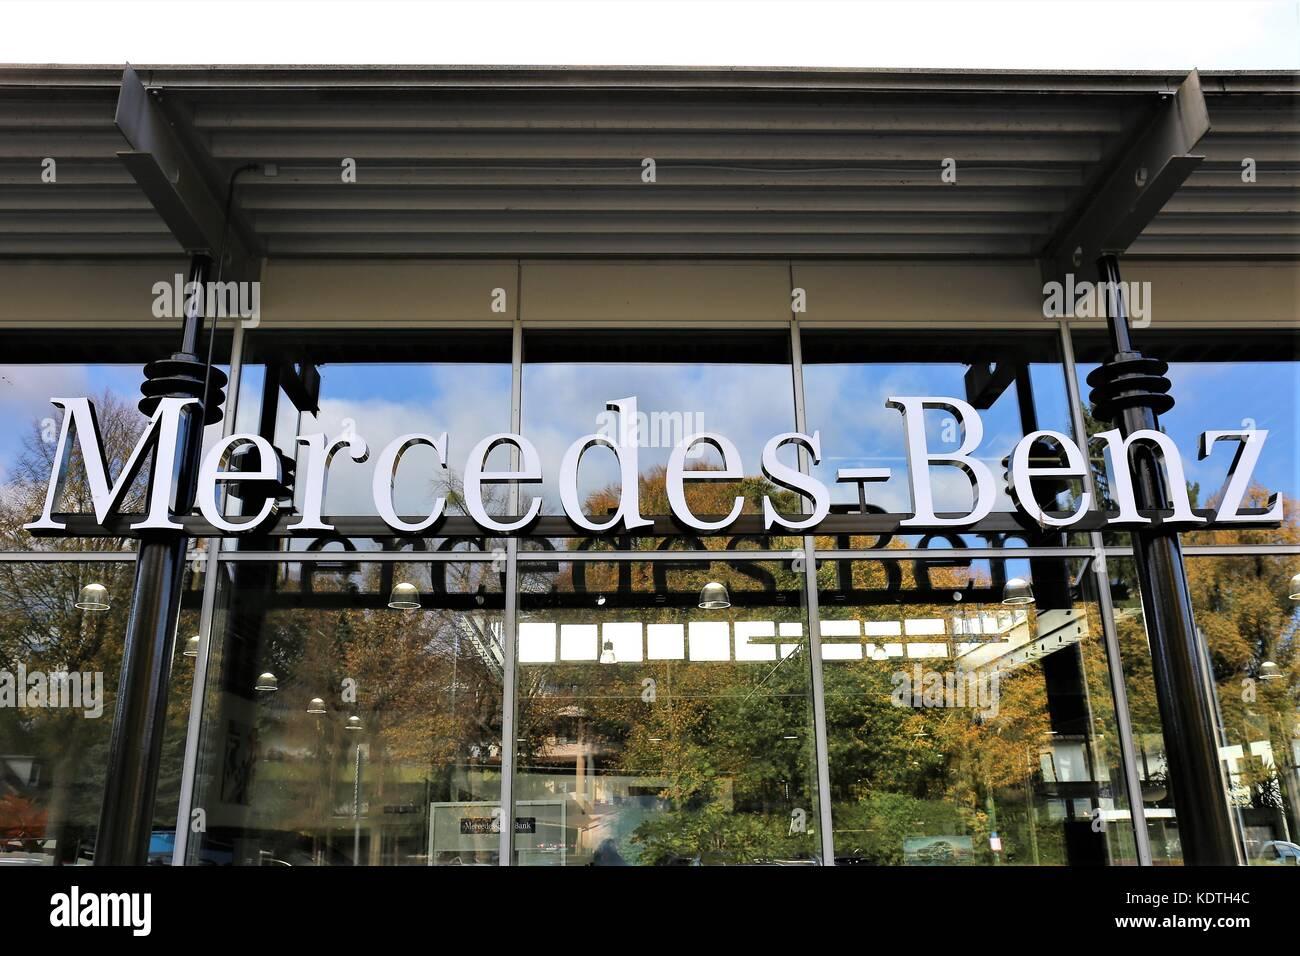 mercedes benz car dealership sign stock photos mercedes. Black Bedroom Furniture Sets. Home Design Ideas